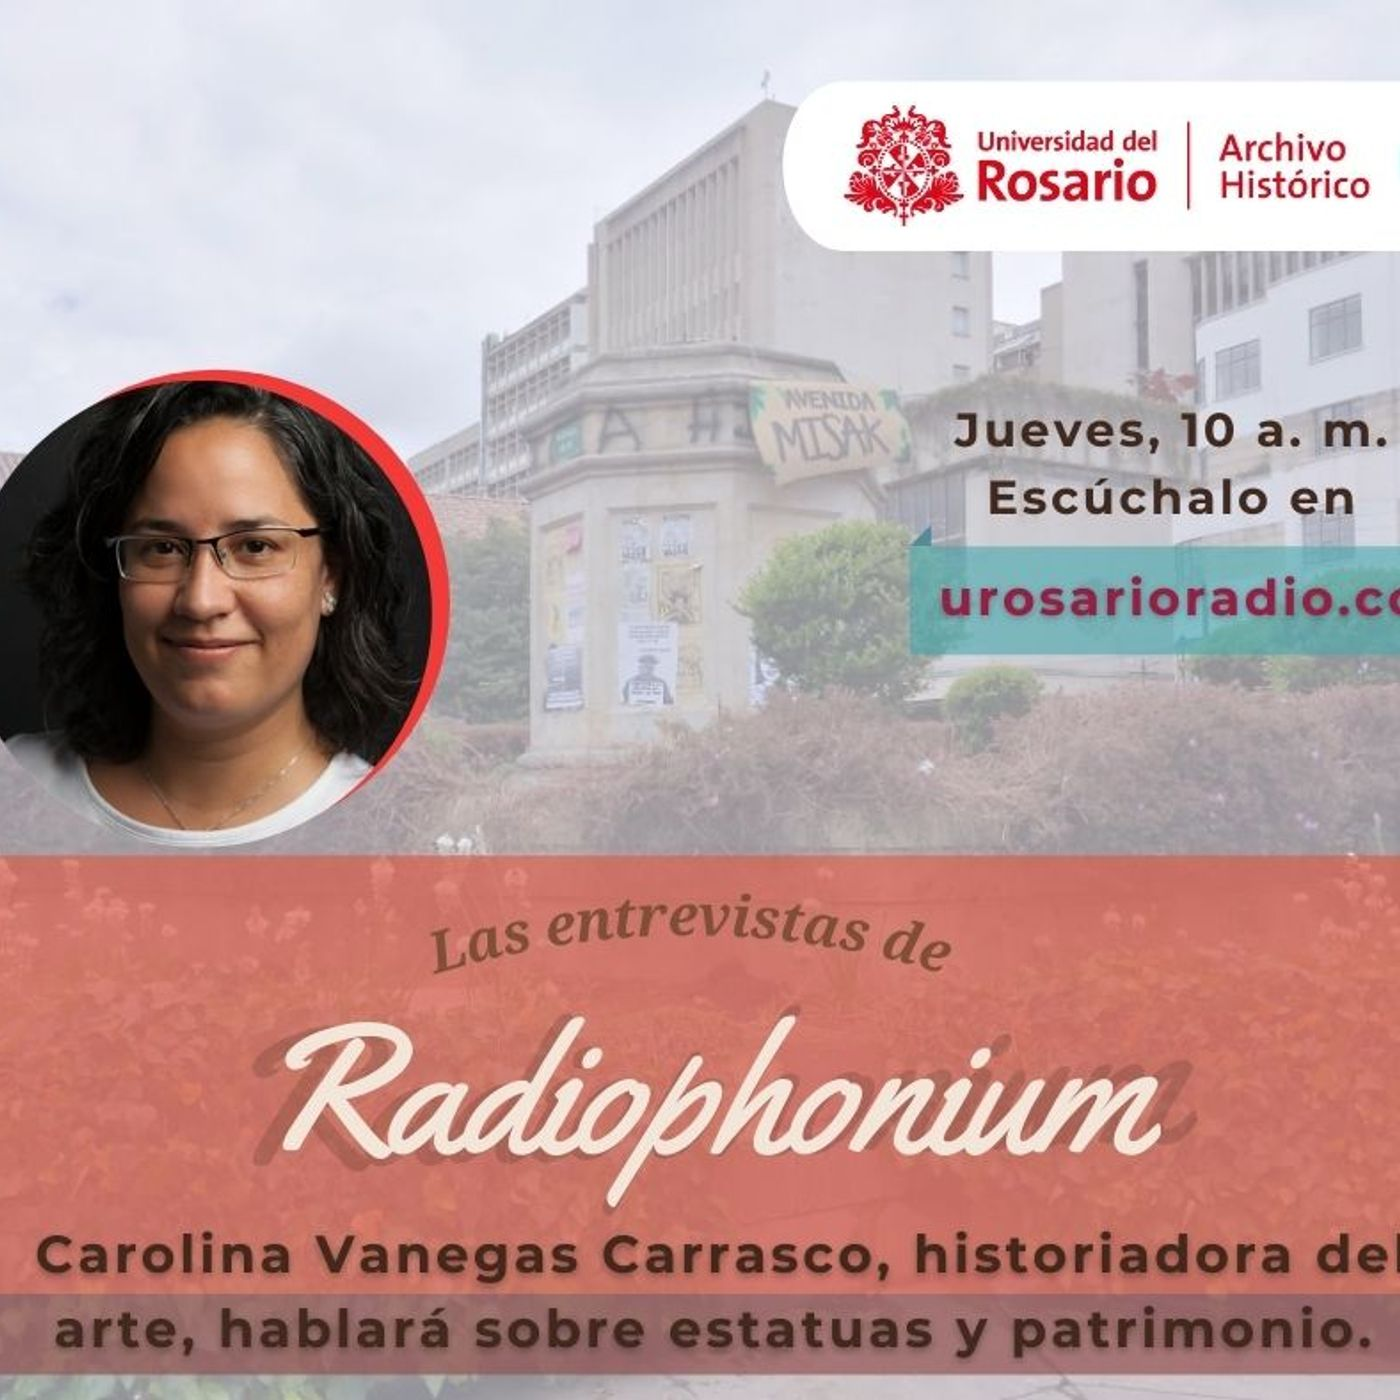 Estatuas y patrimonio con la historiadora Carolina Vanegas